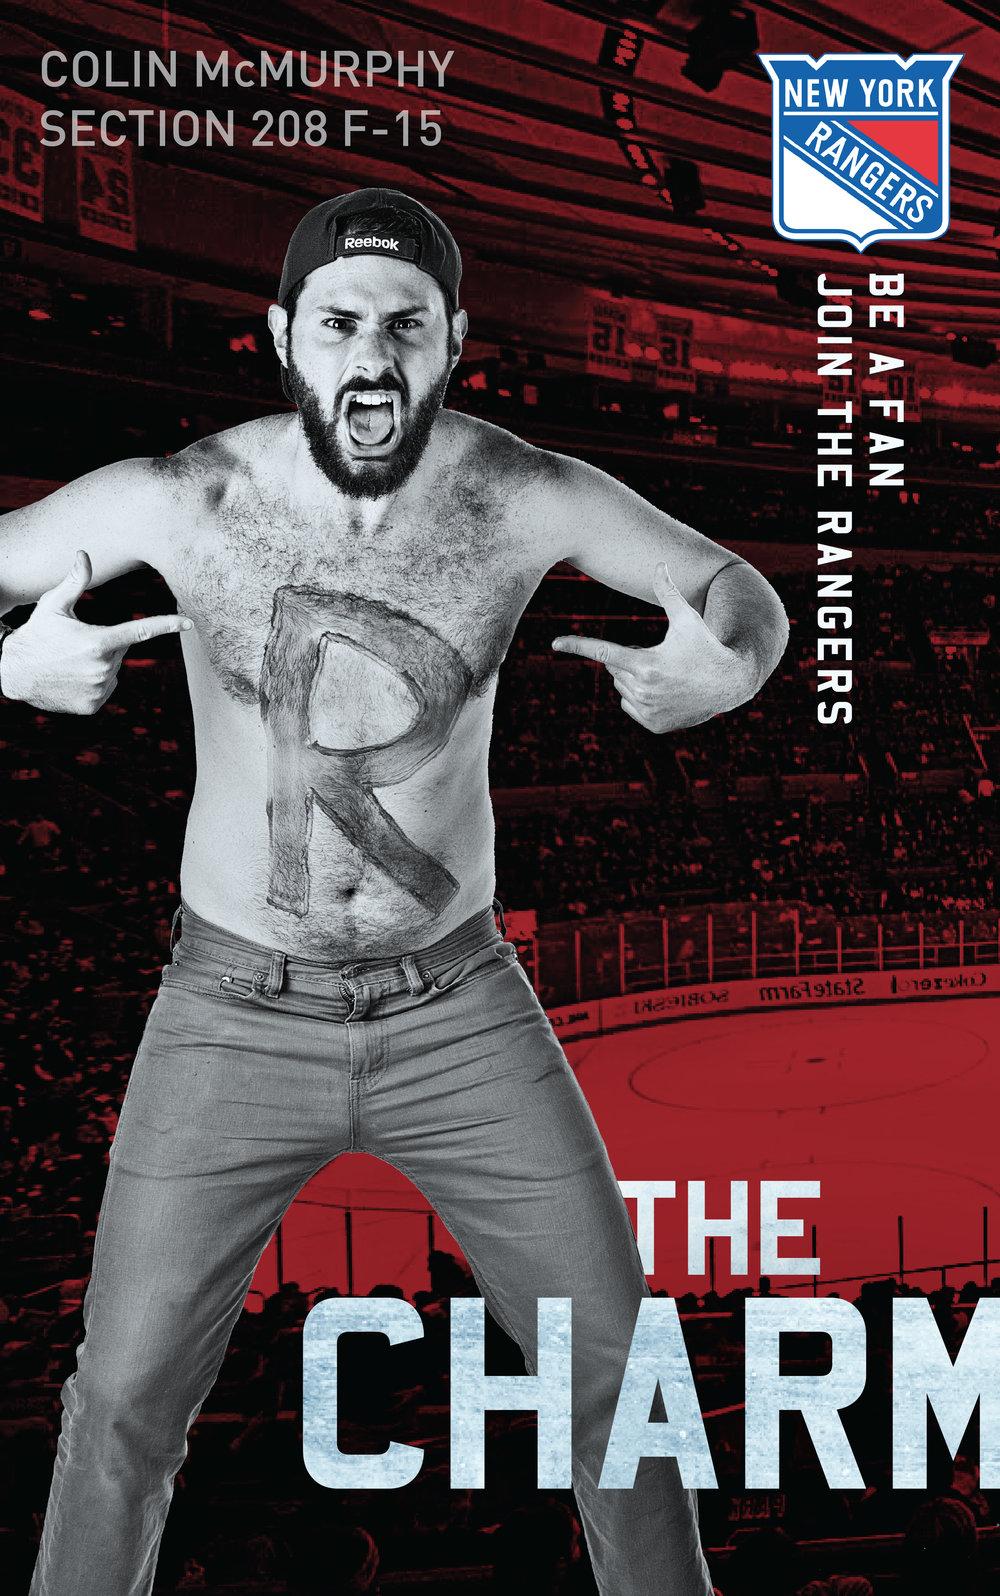 posters_NHL_indepedentstudy_qt6-08.jpg